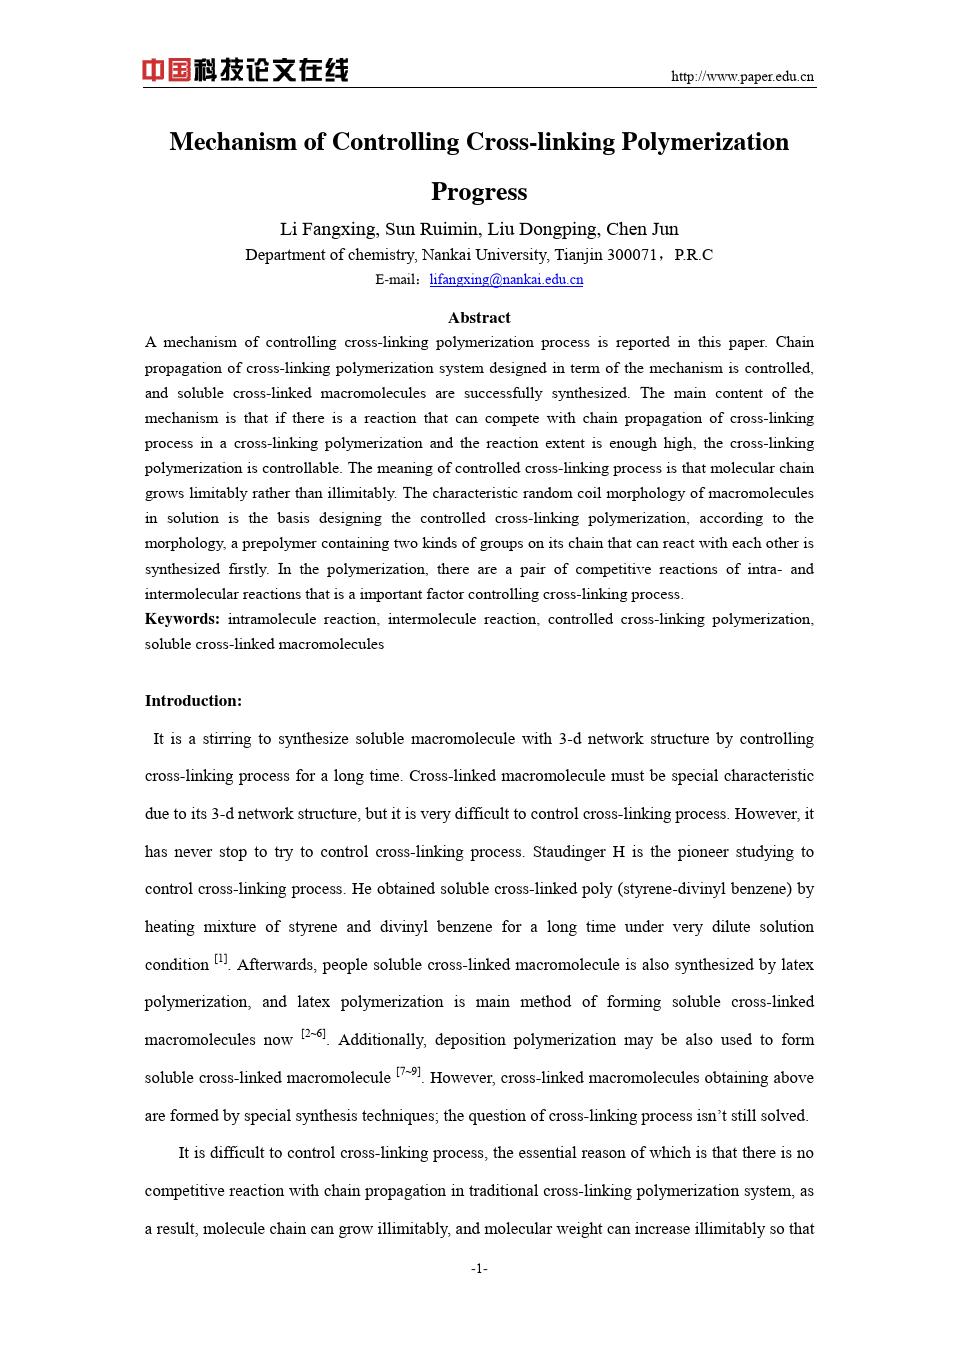 Mechanism of Controlling Cross-linking Polymerization Progress